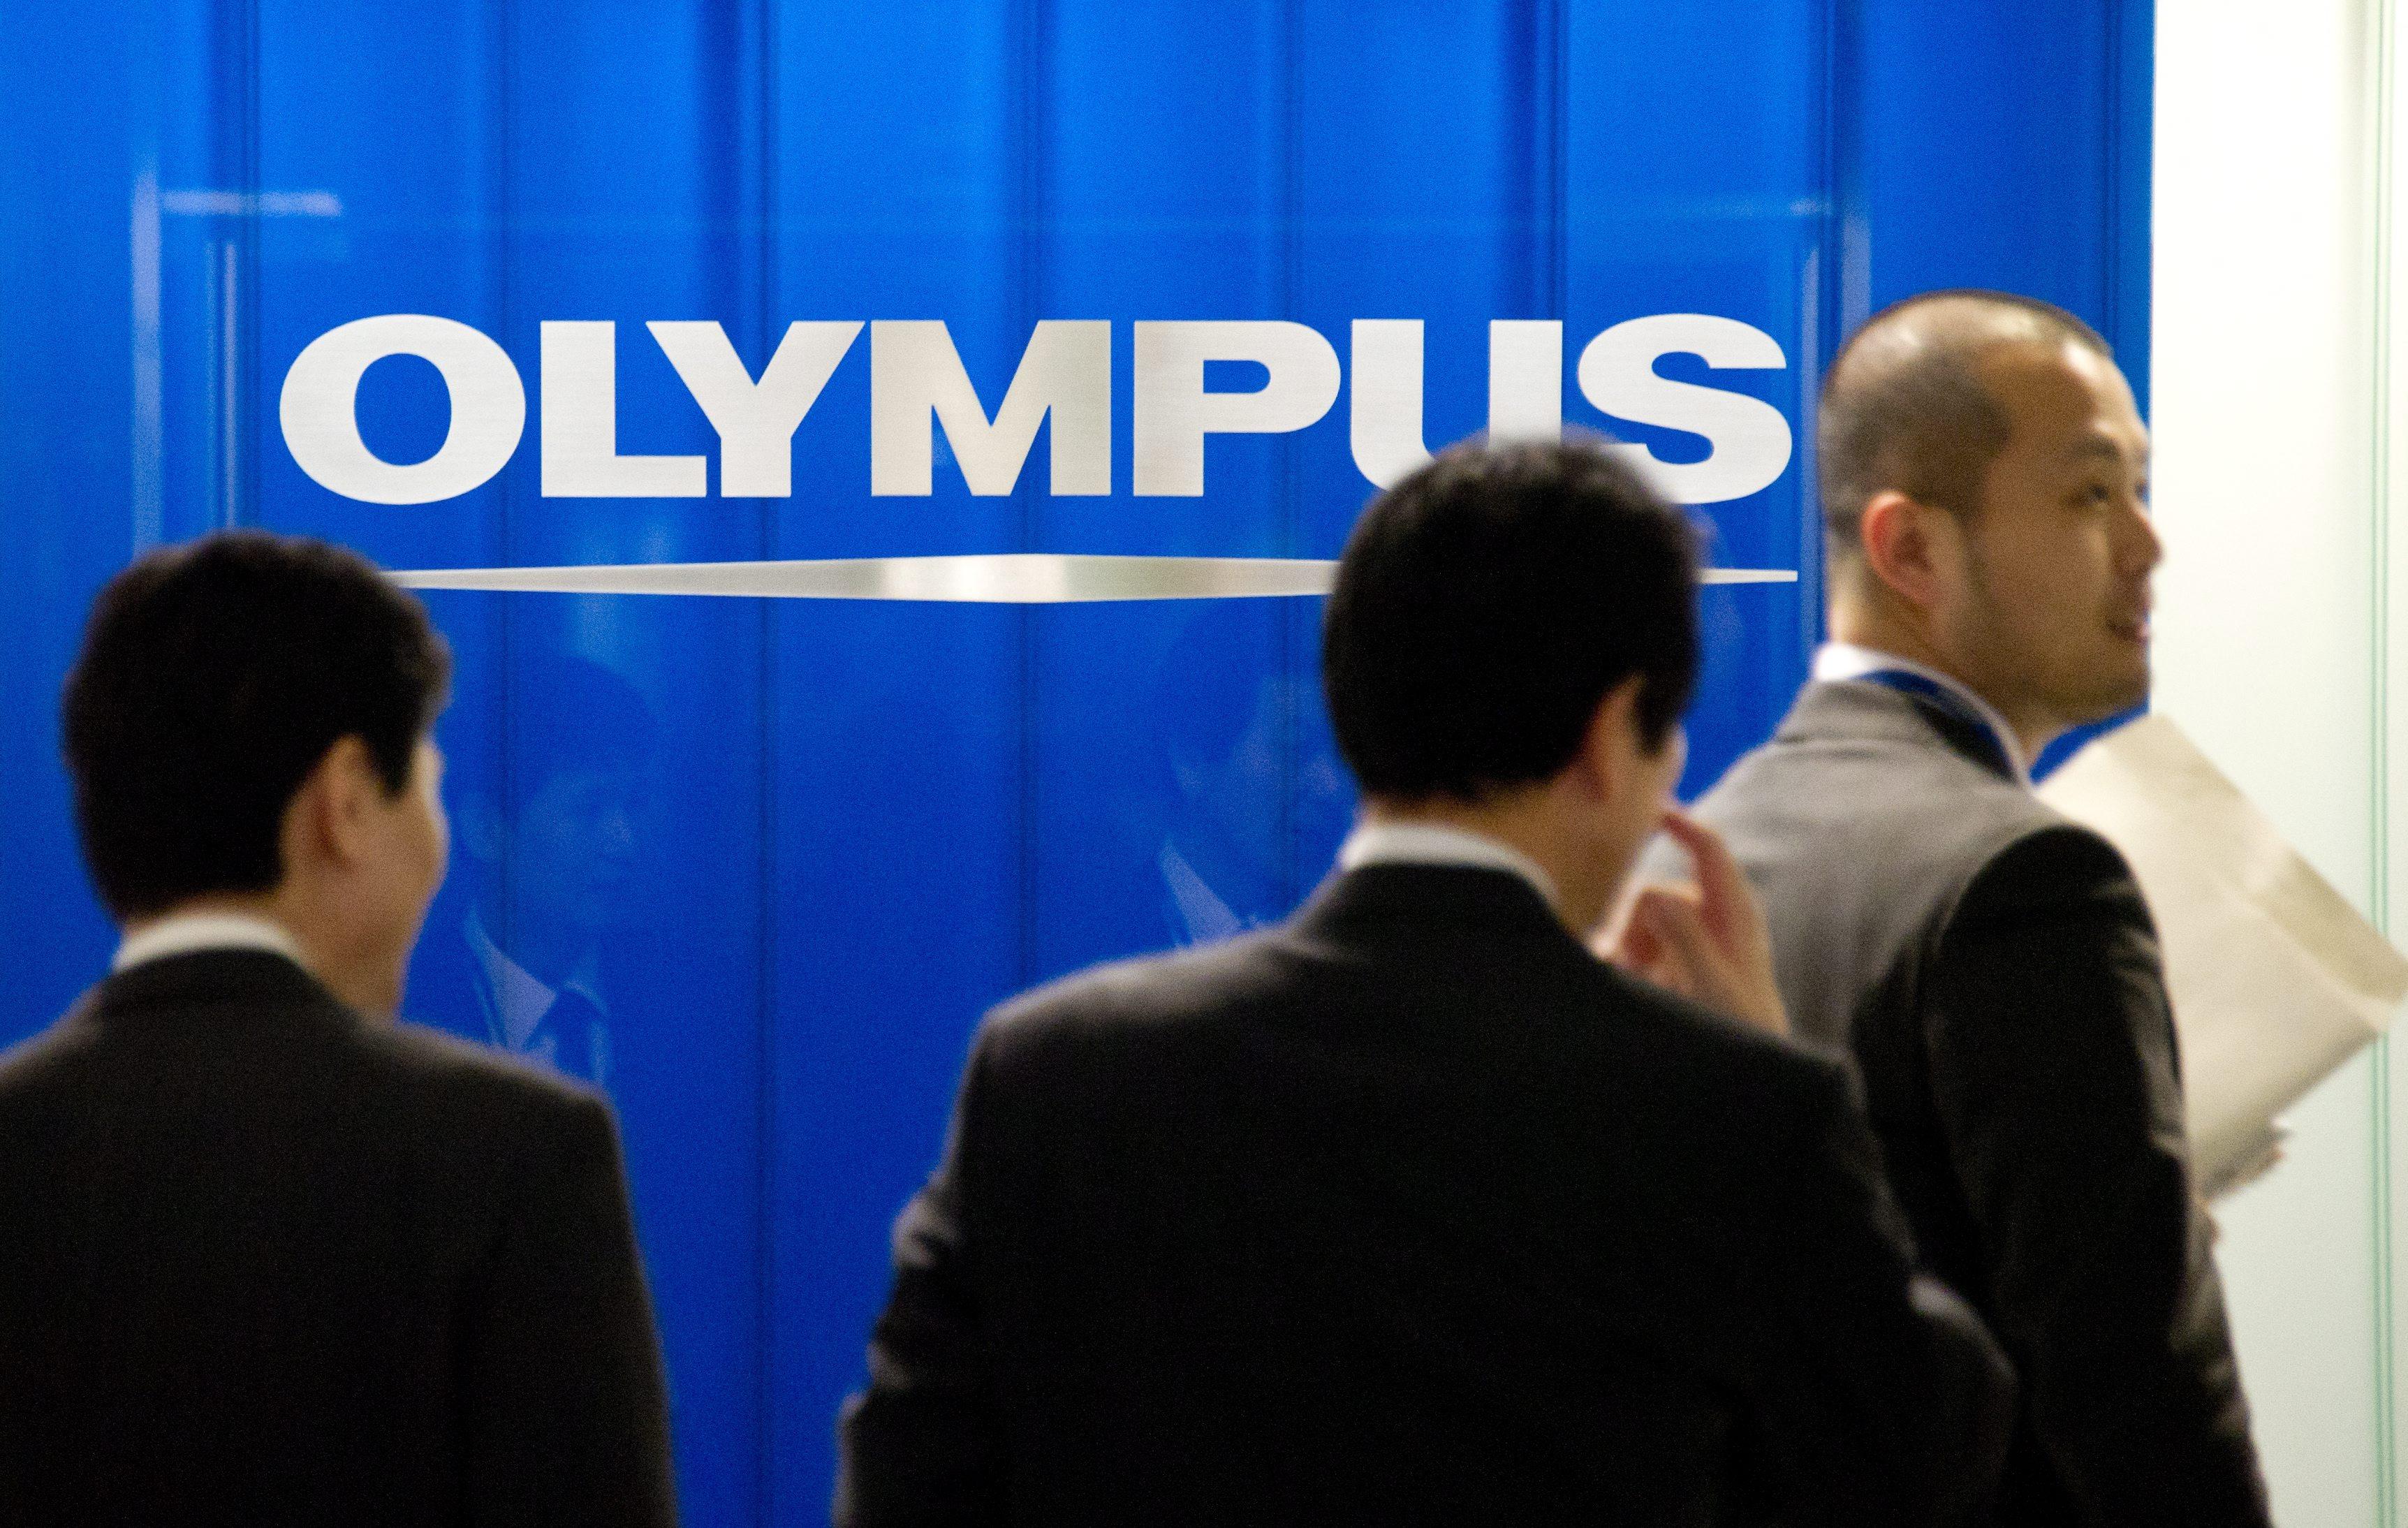 Затвор грози бивши шефове на Olympus